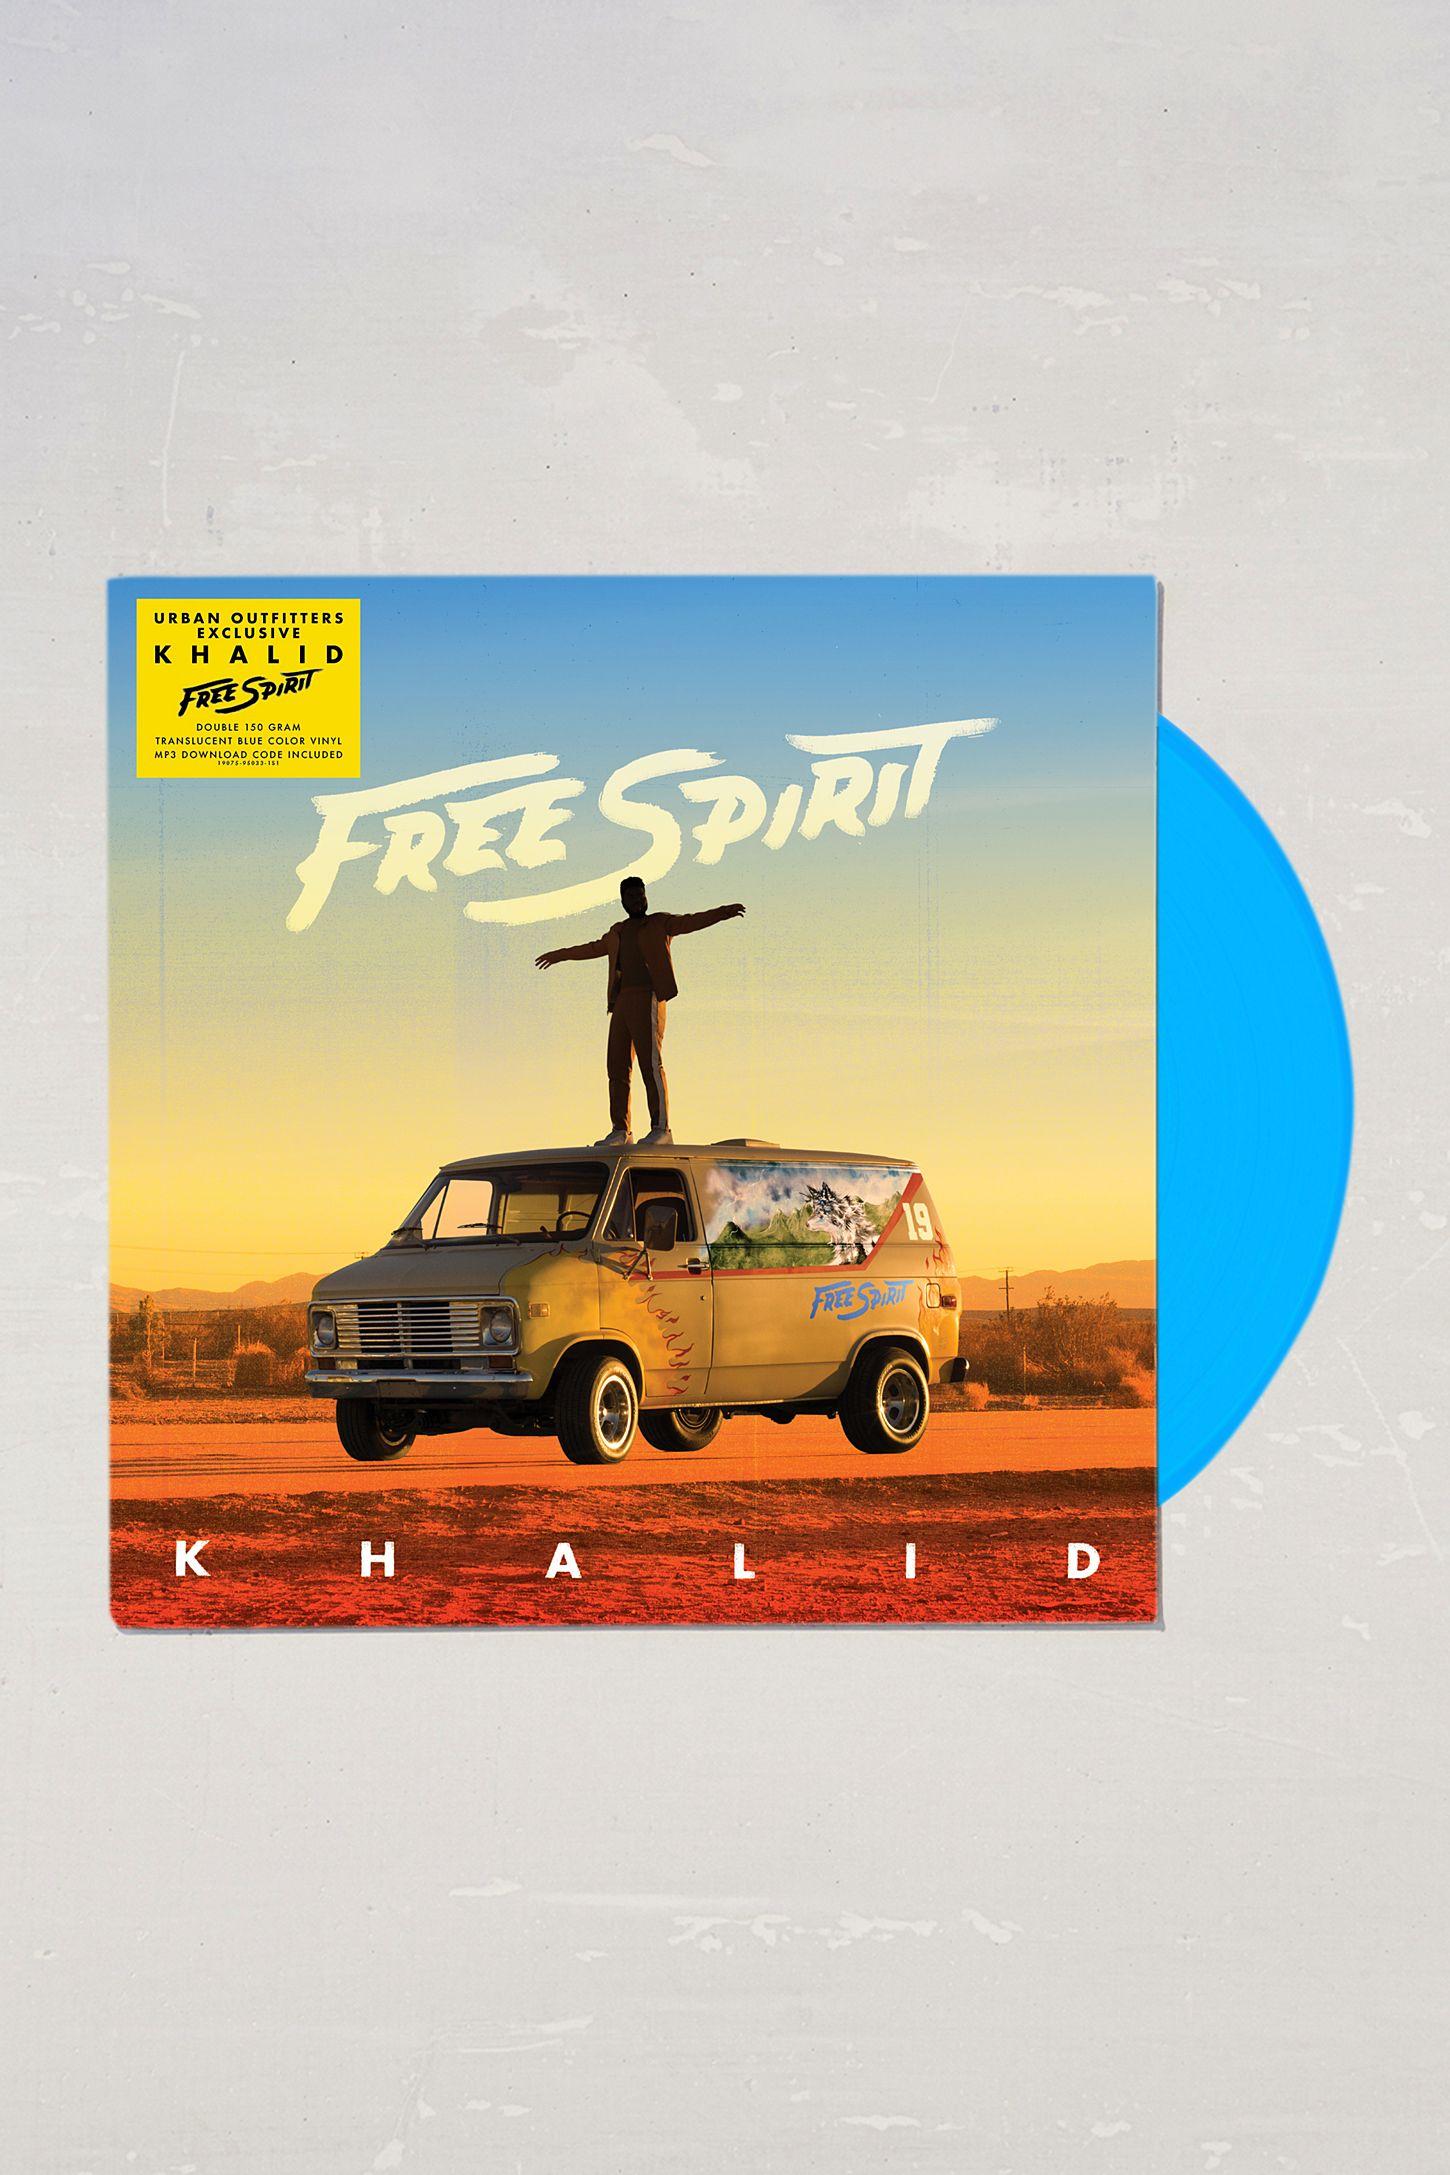 Khalid - Free Spirit Limited 2XLP